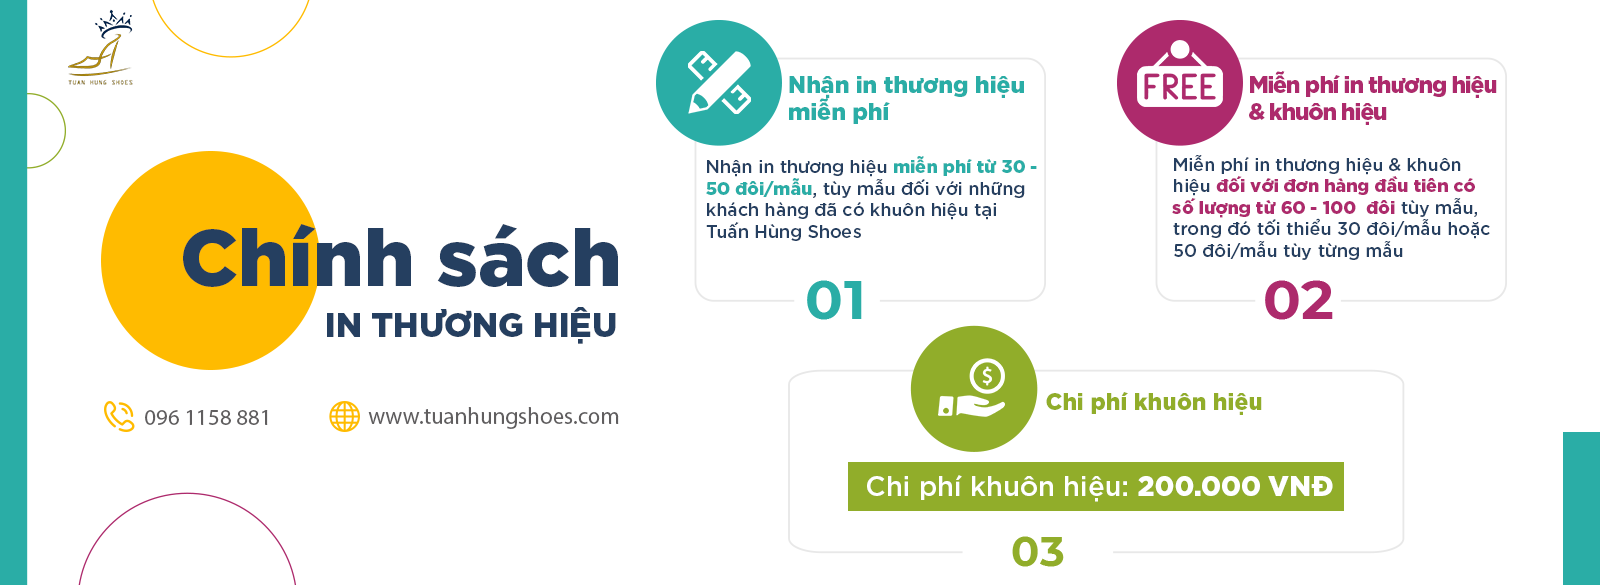 chinh sach in thuong hieu tuan hung shoes 1